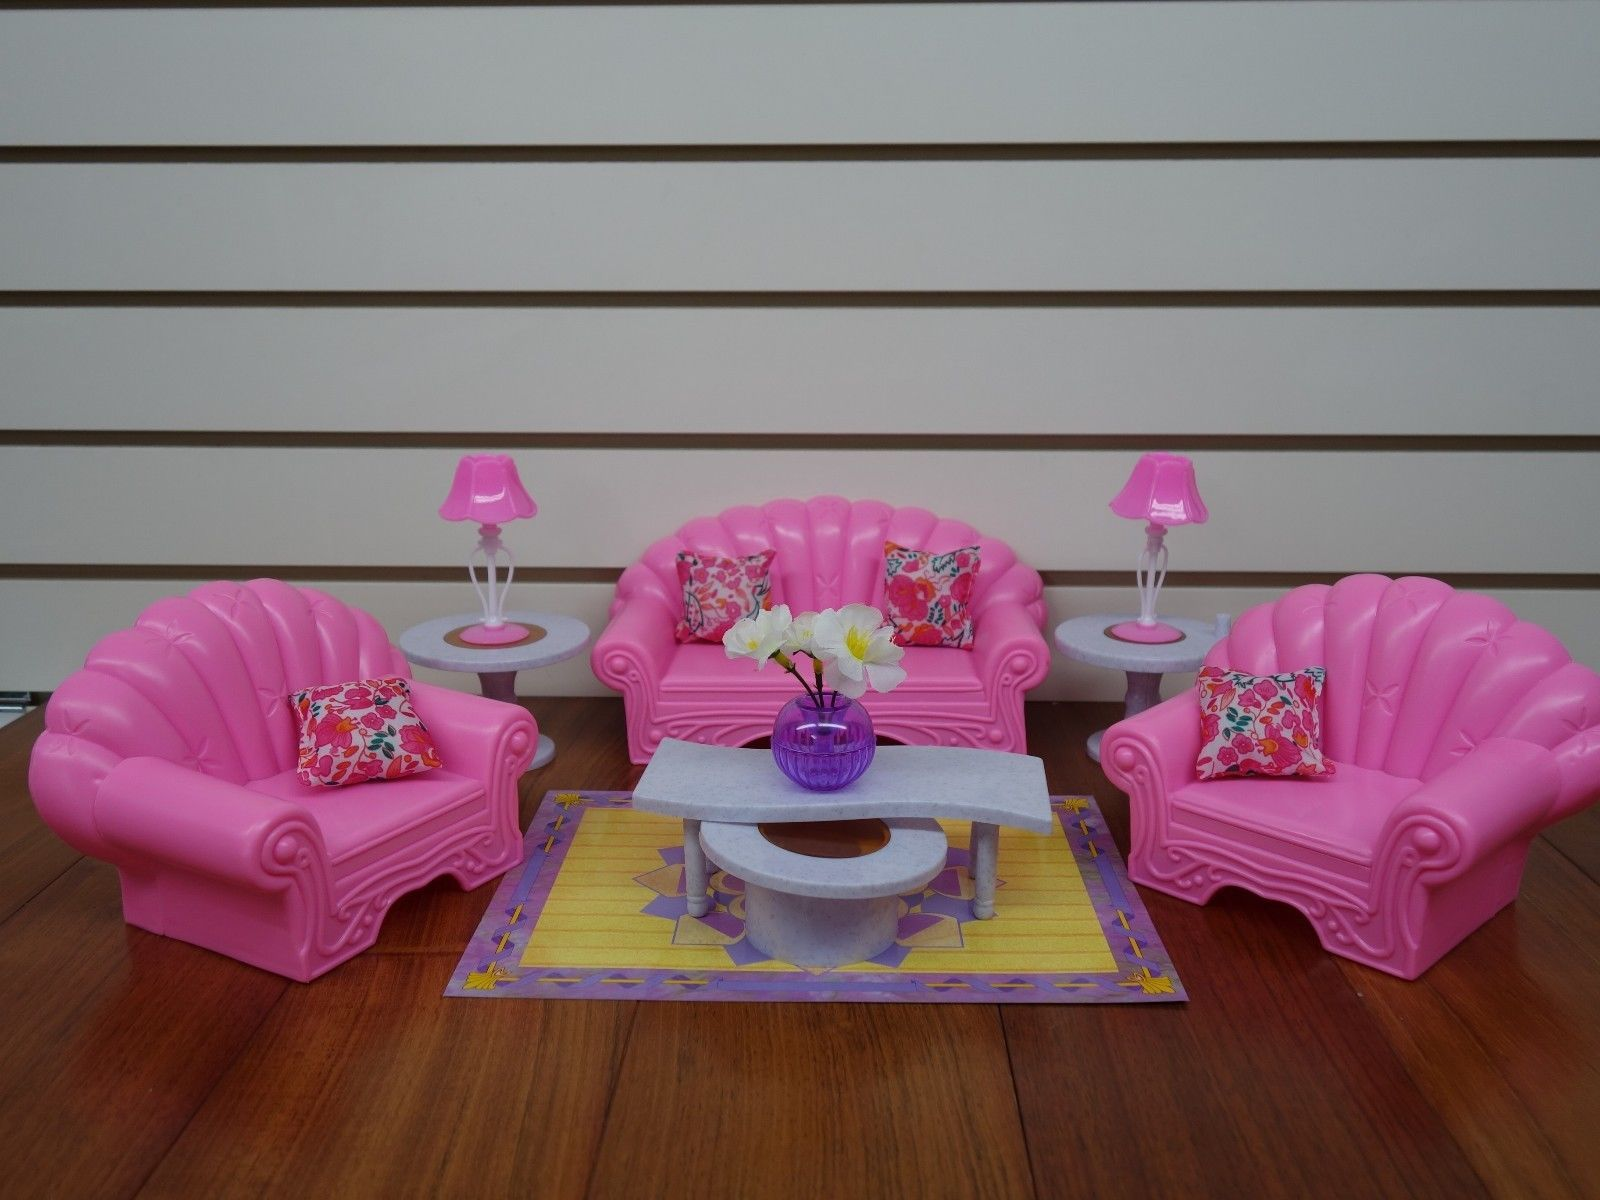 Gloria Barbie Doll House Furniture 22004 My Fancy Life Living Room